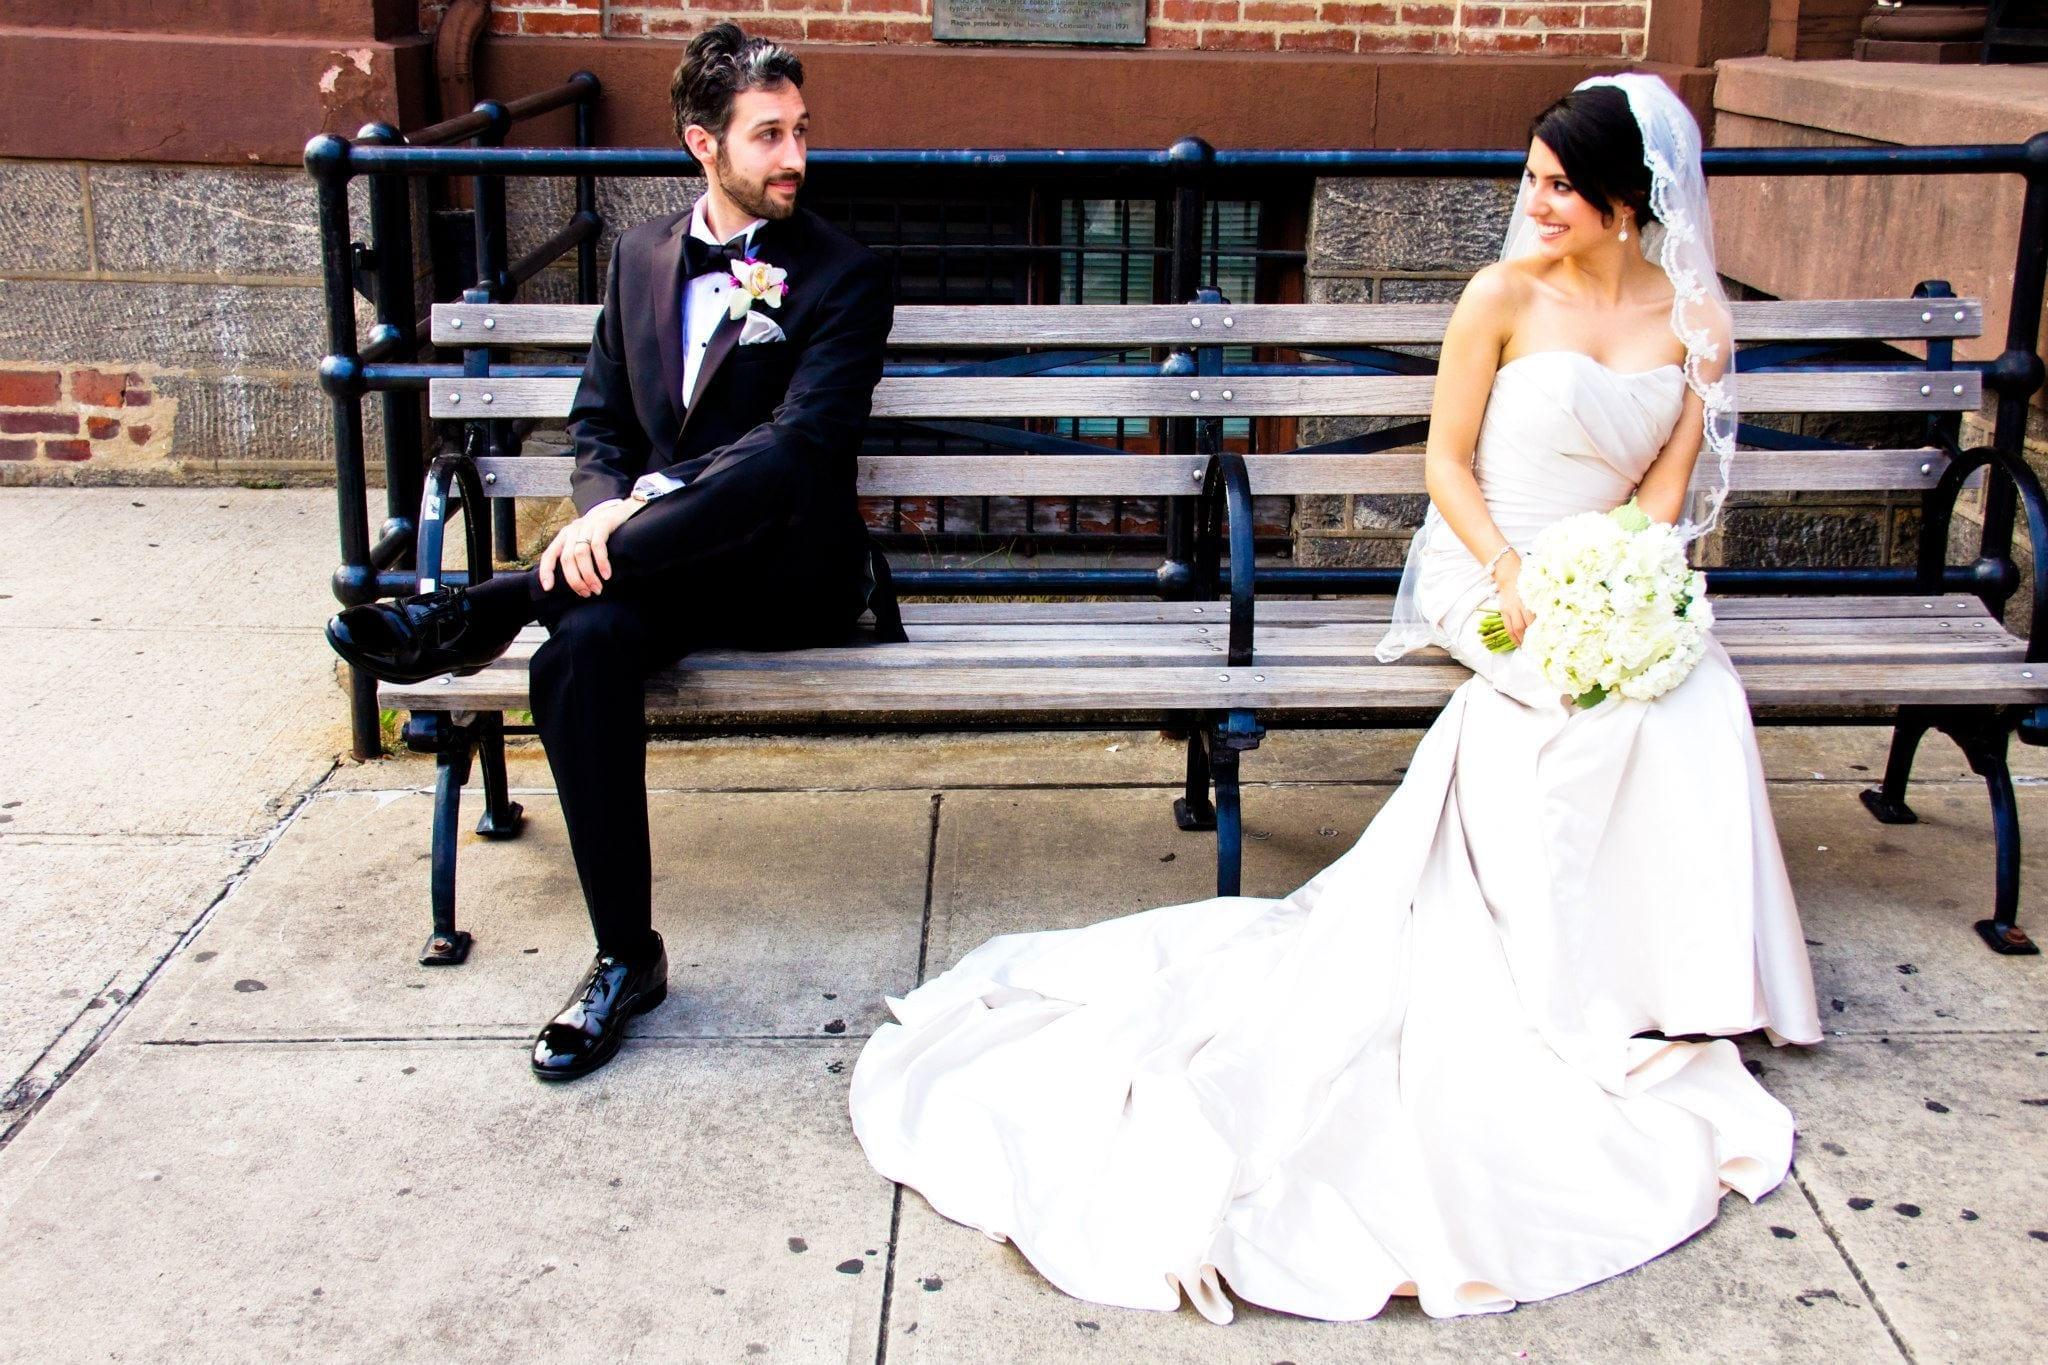 frank-and-medina 50 Romantic Jewish Couples-Wedding and Relationship Photos